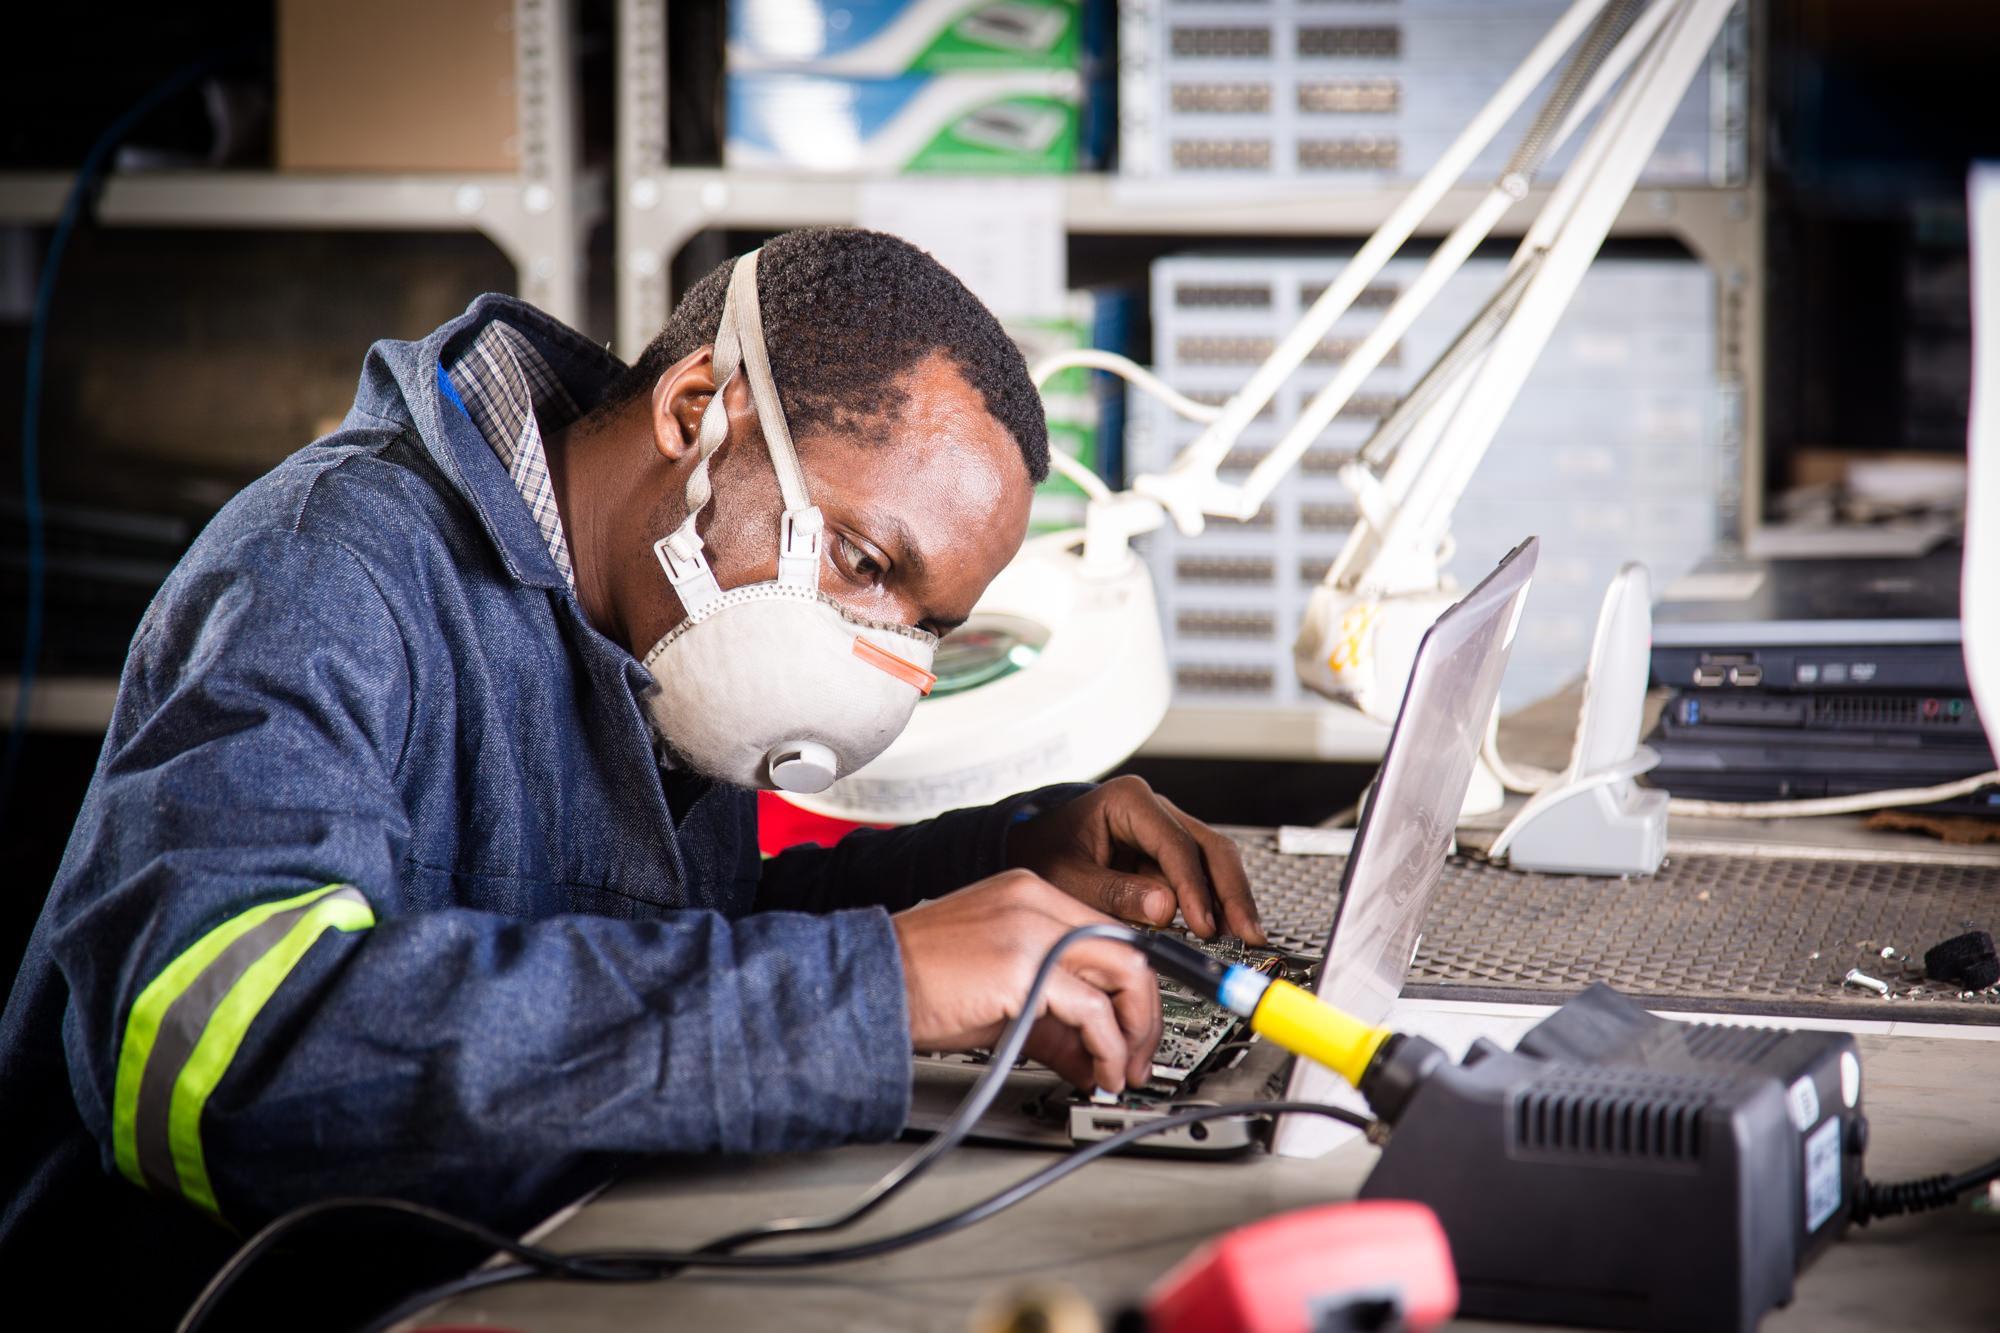 tim gerges industrial photographer device-5743.jpg